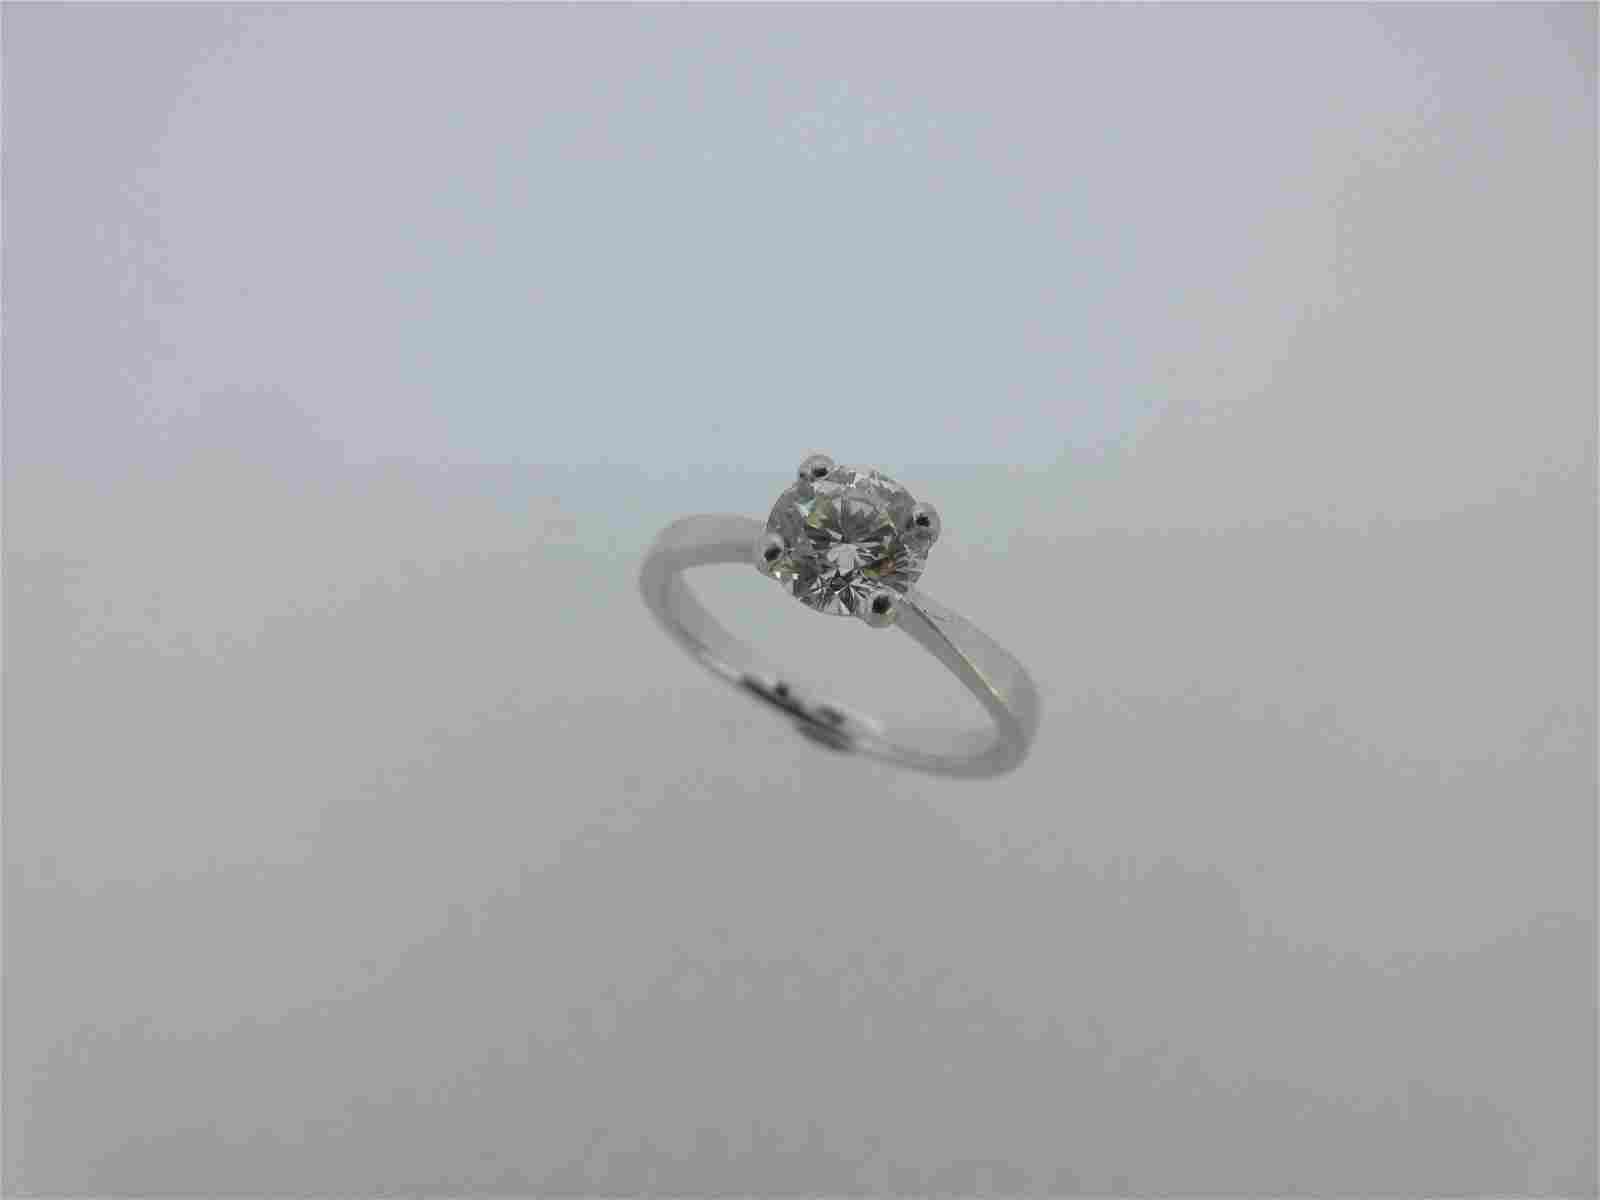 A single stone diamond ring set in platinum,